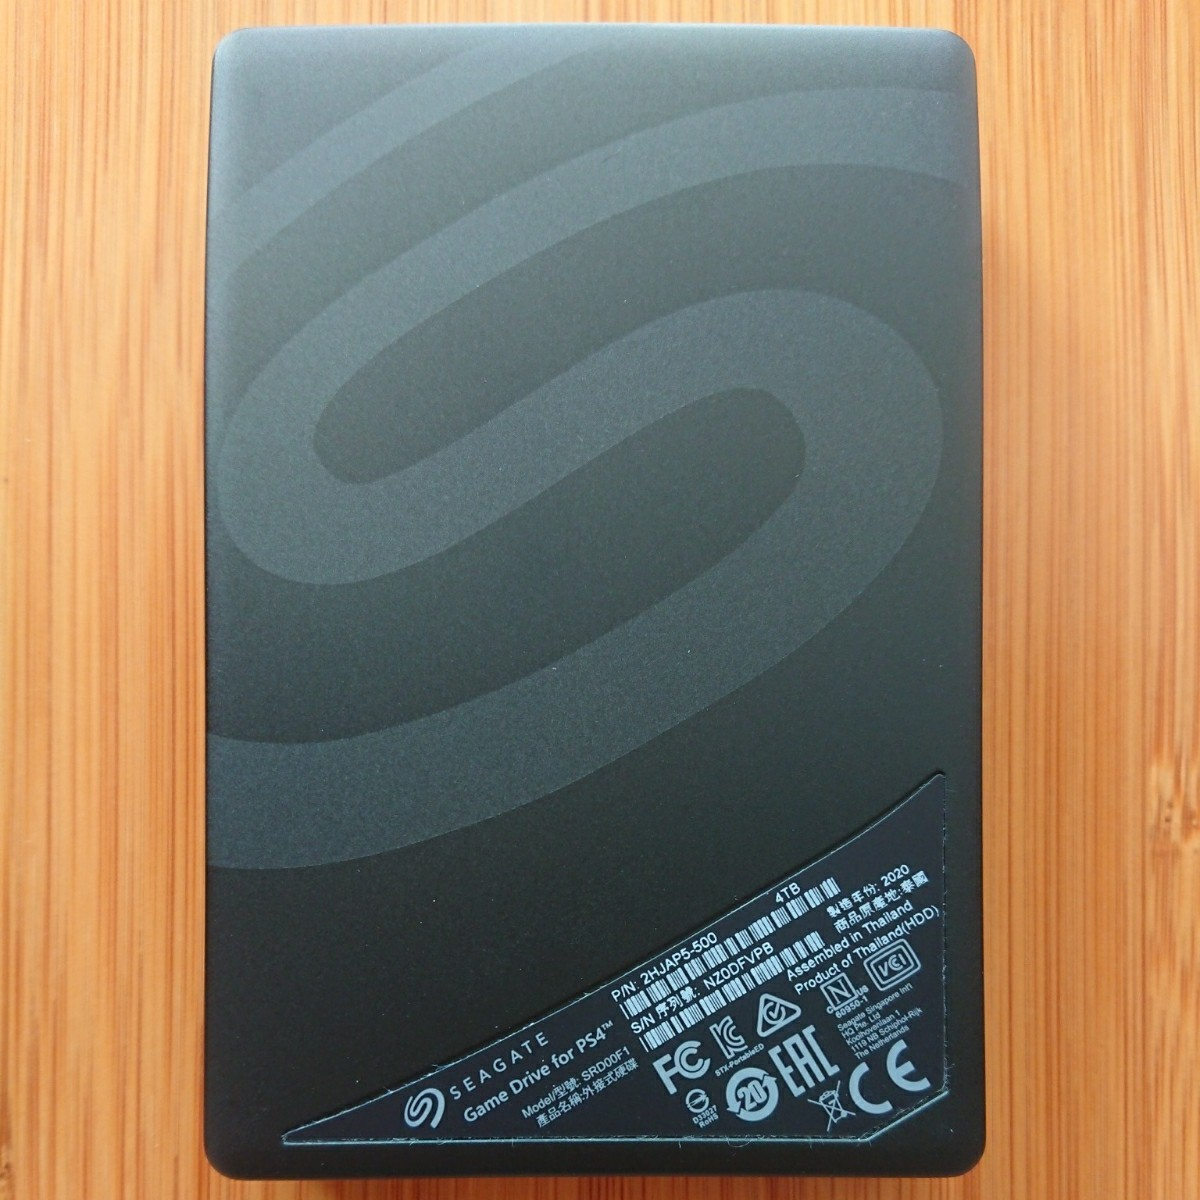 Seagate ポータブルHDD 4TB STGD4000400